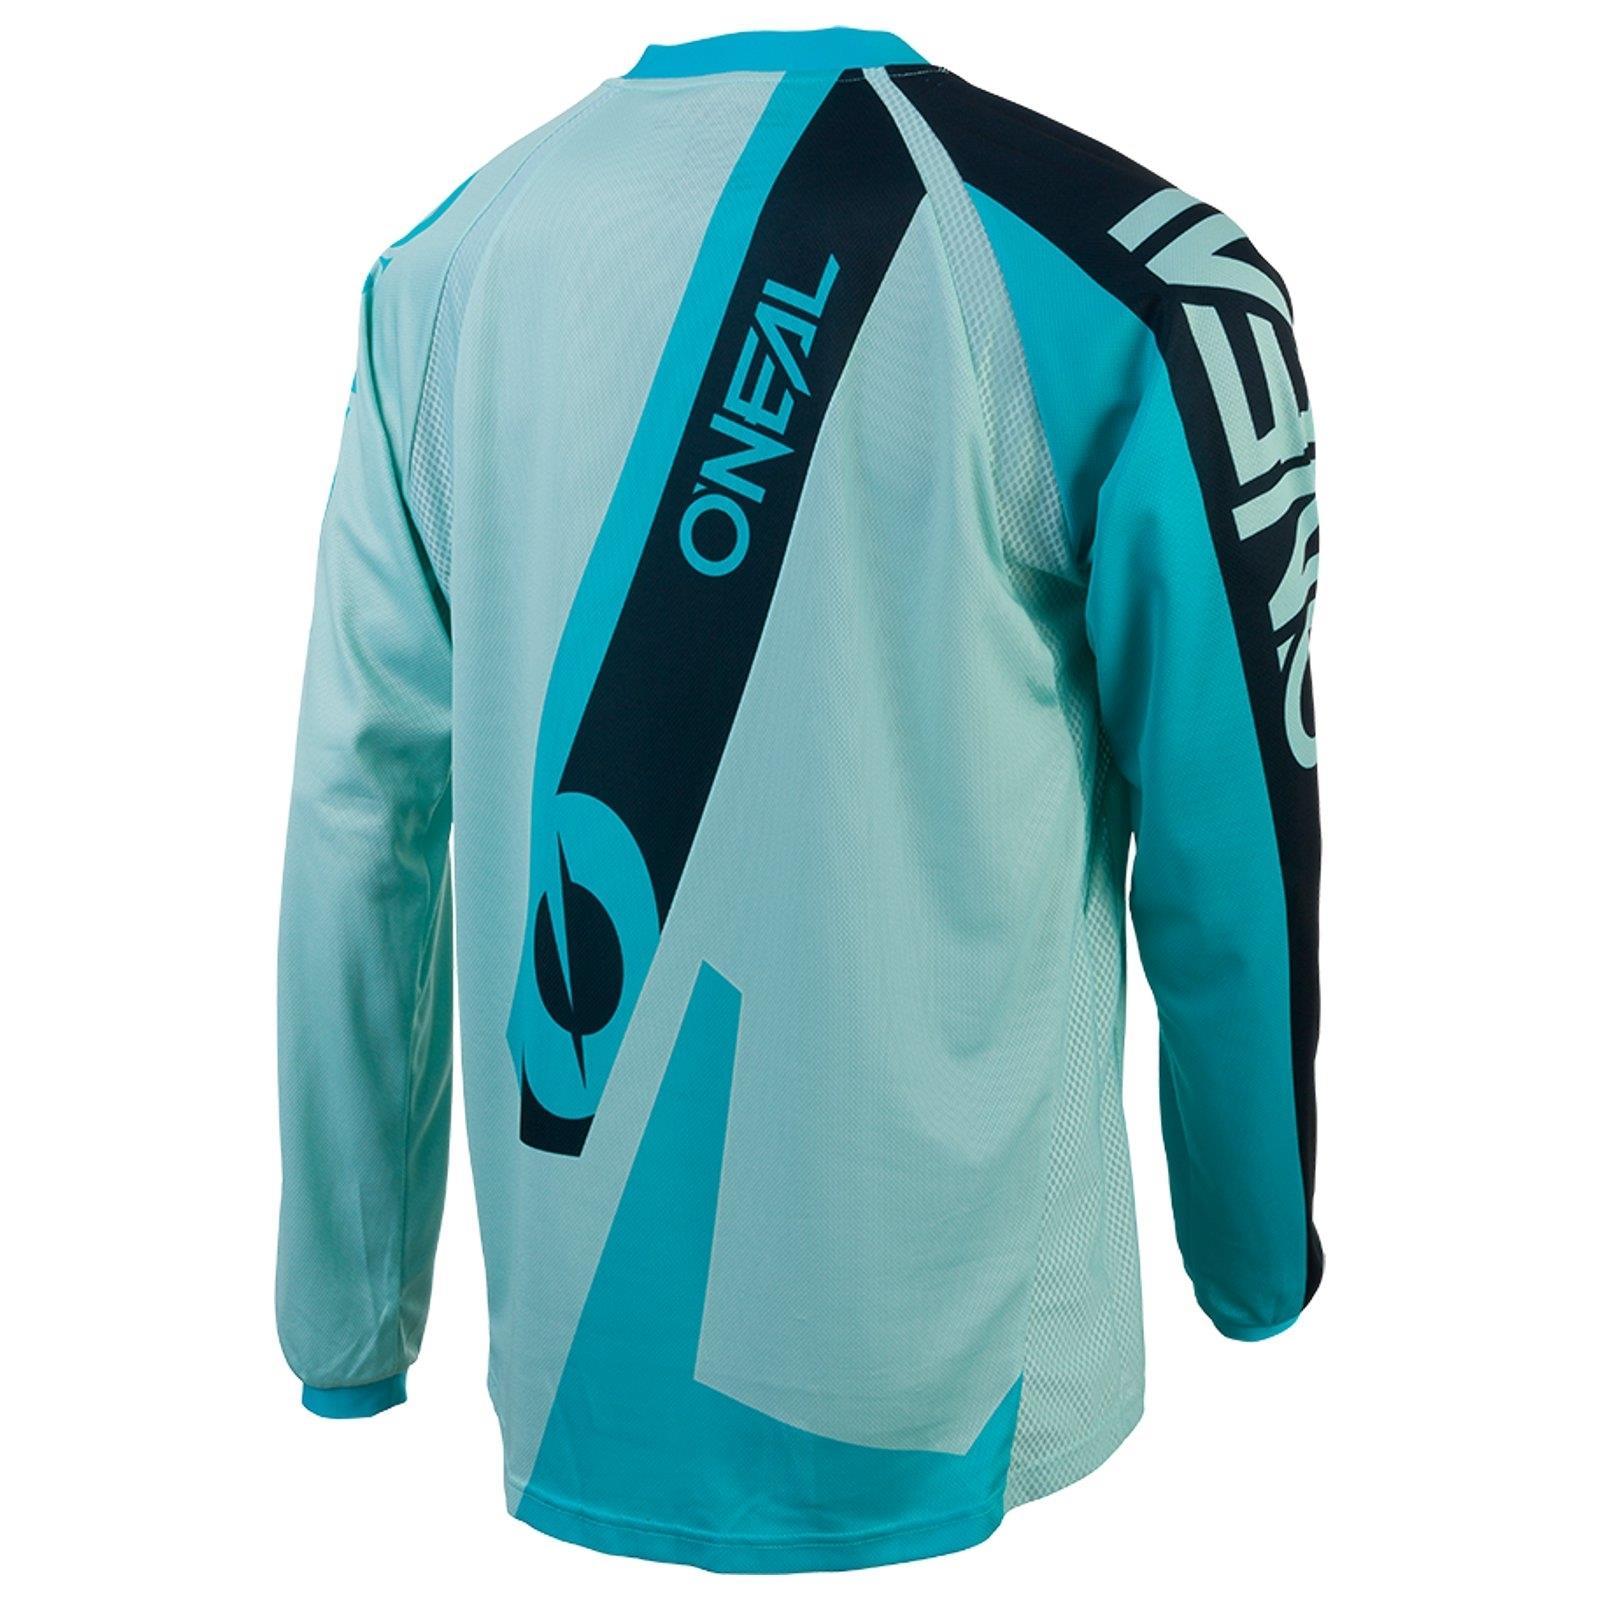 O-039-Neal-elemento-Mayhem-JERSEY-Racewear-Motocross-Maglia-MX-DH-FR-MTB-MOUNTAIN-BIKE miniatura 66